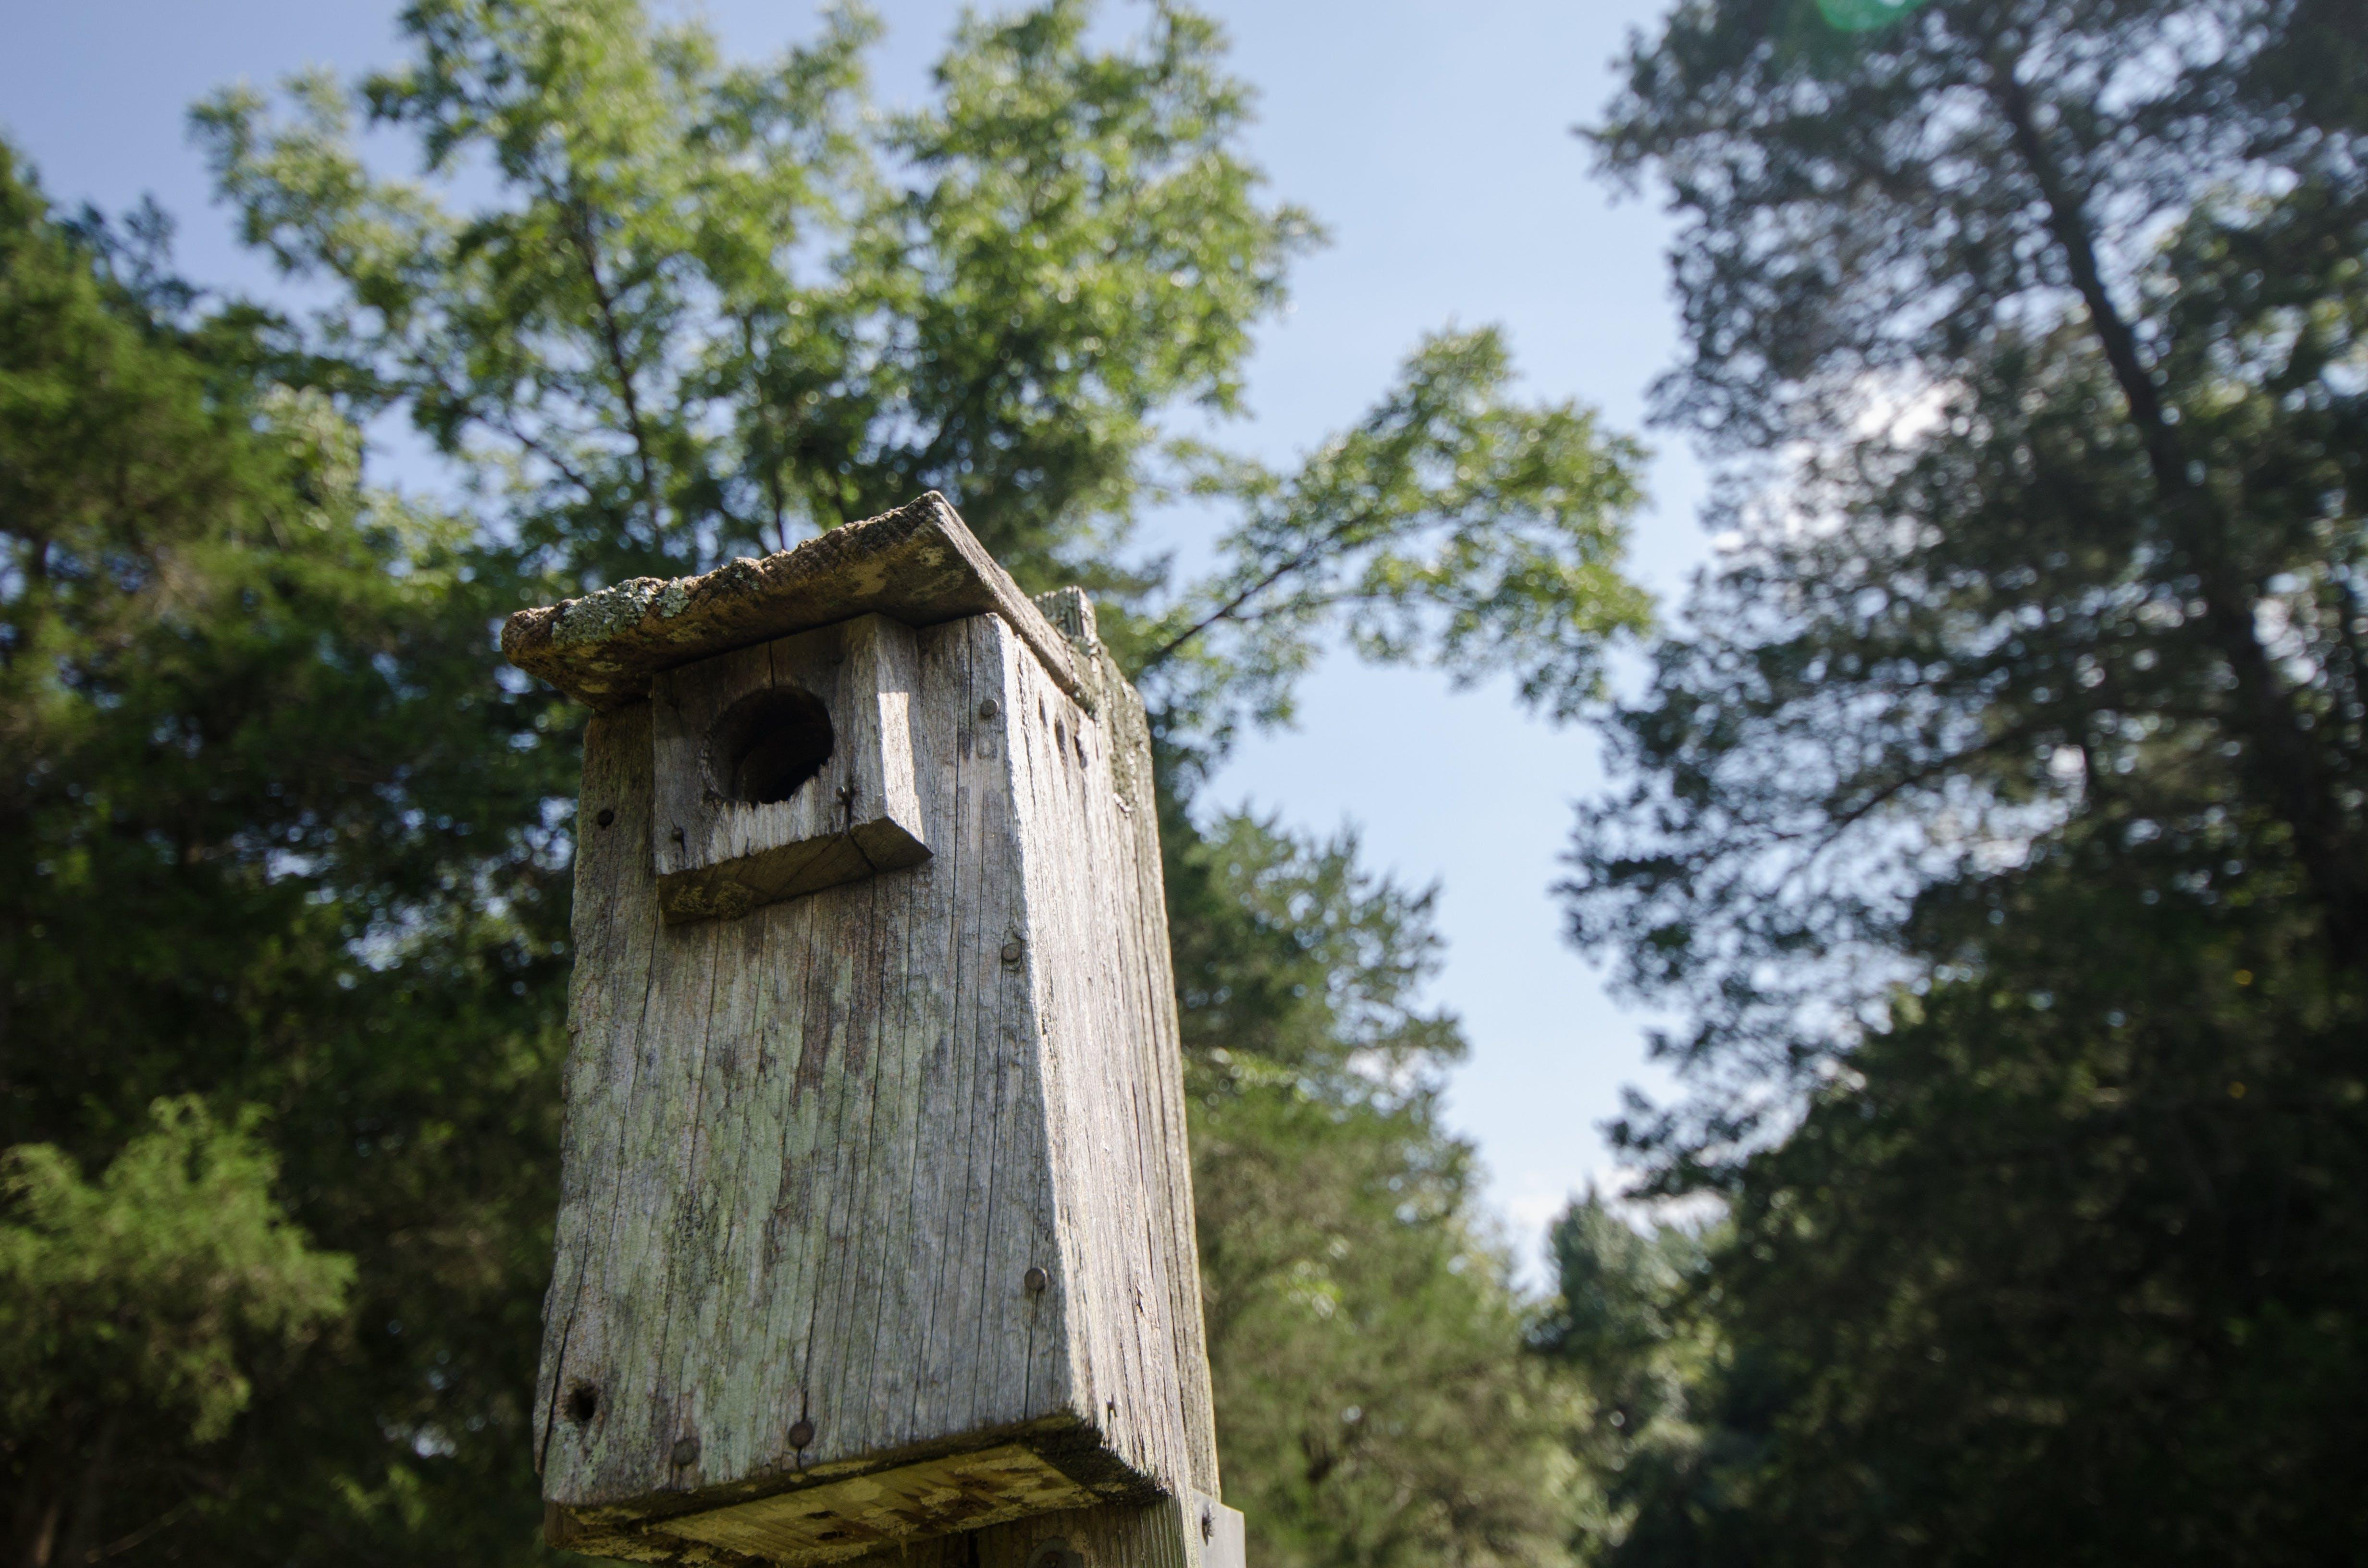 Free stock photo of wood, nature, bird, trees